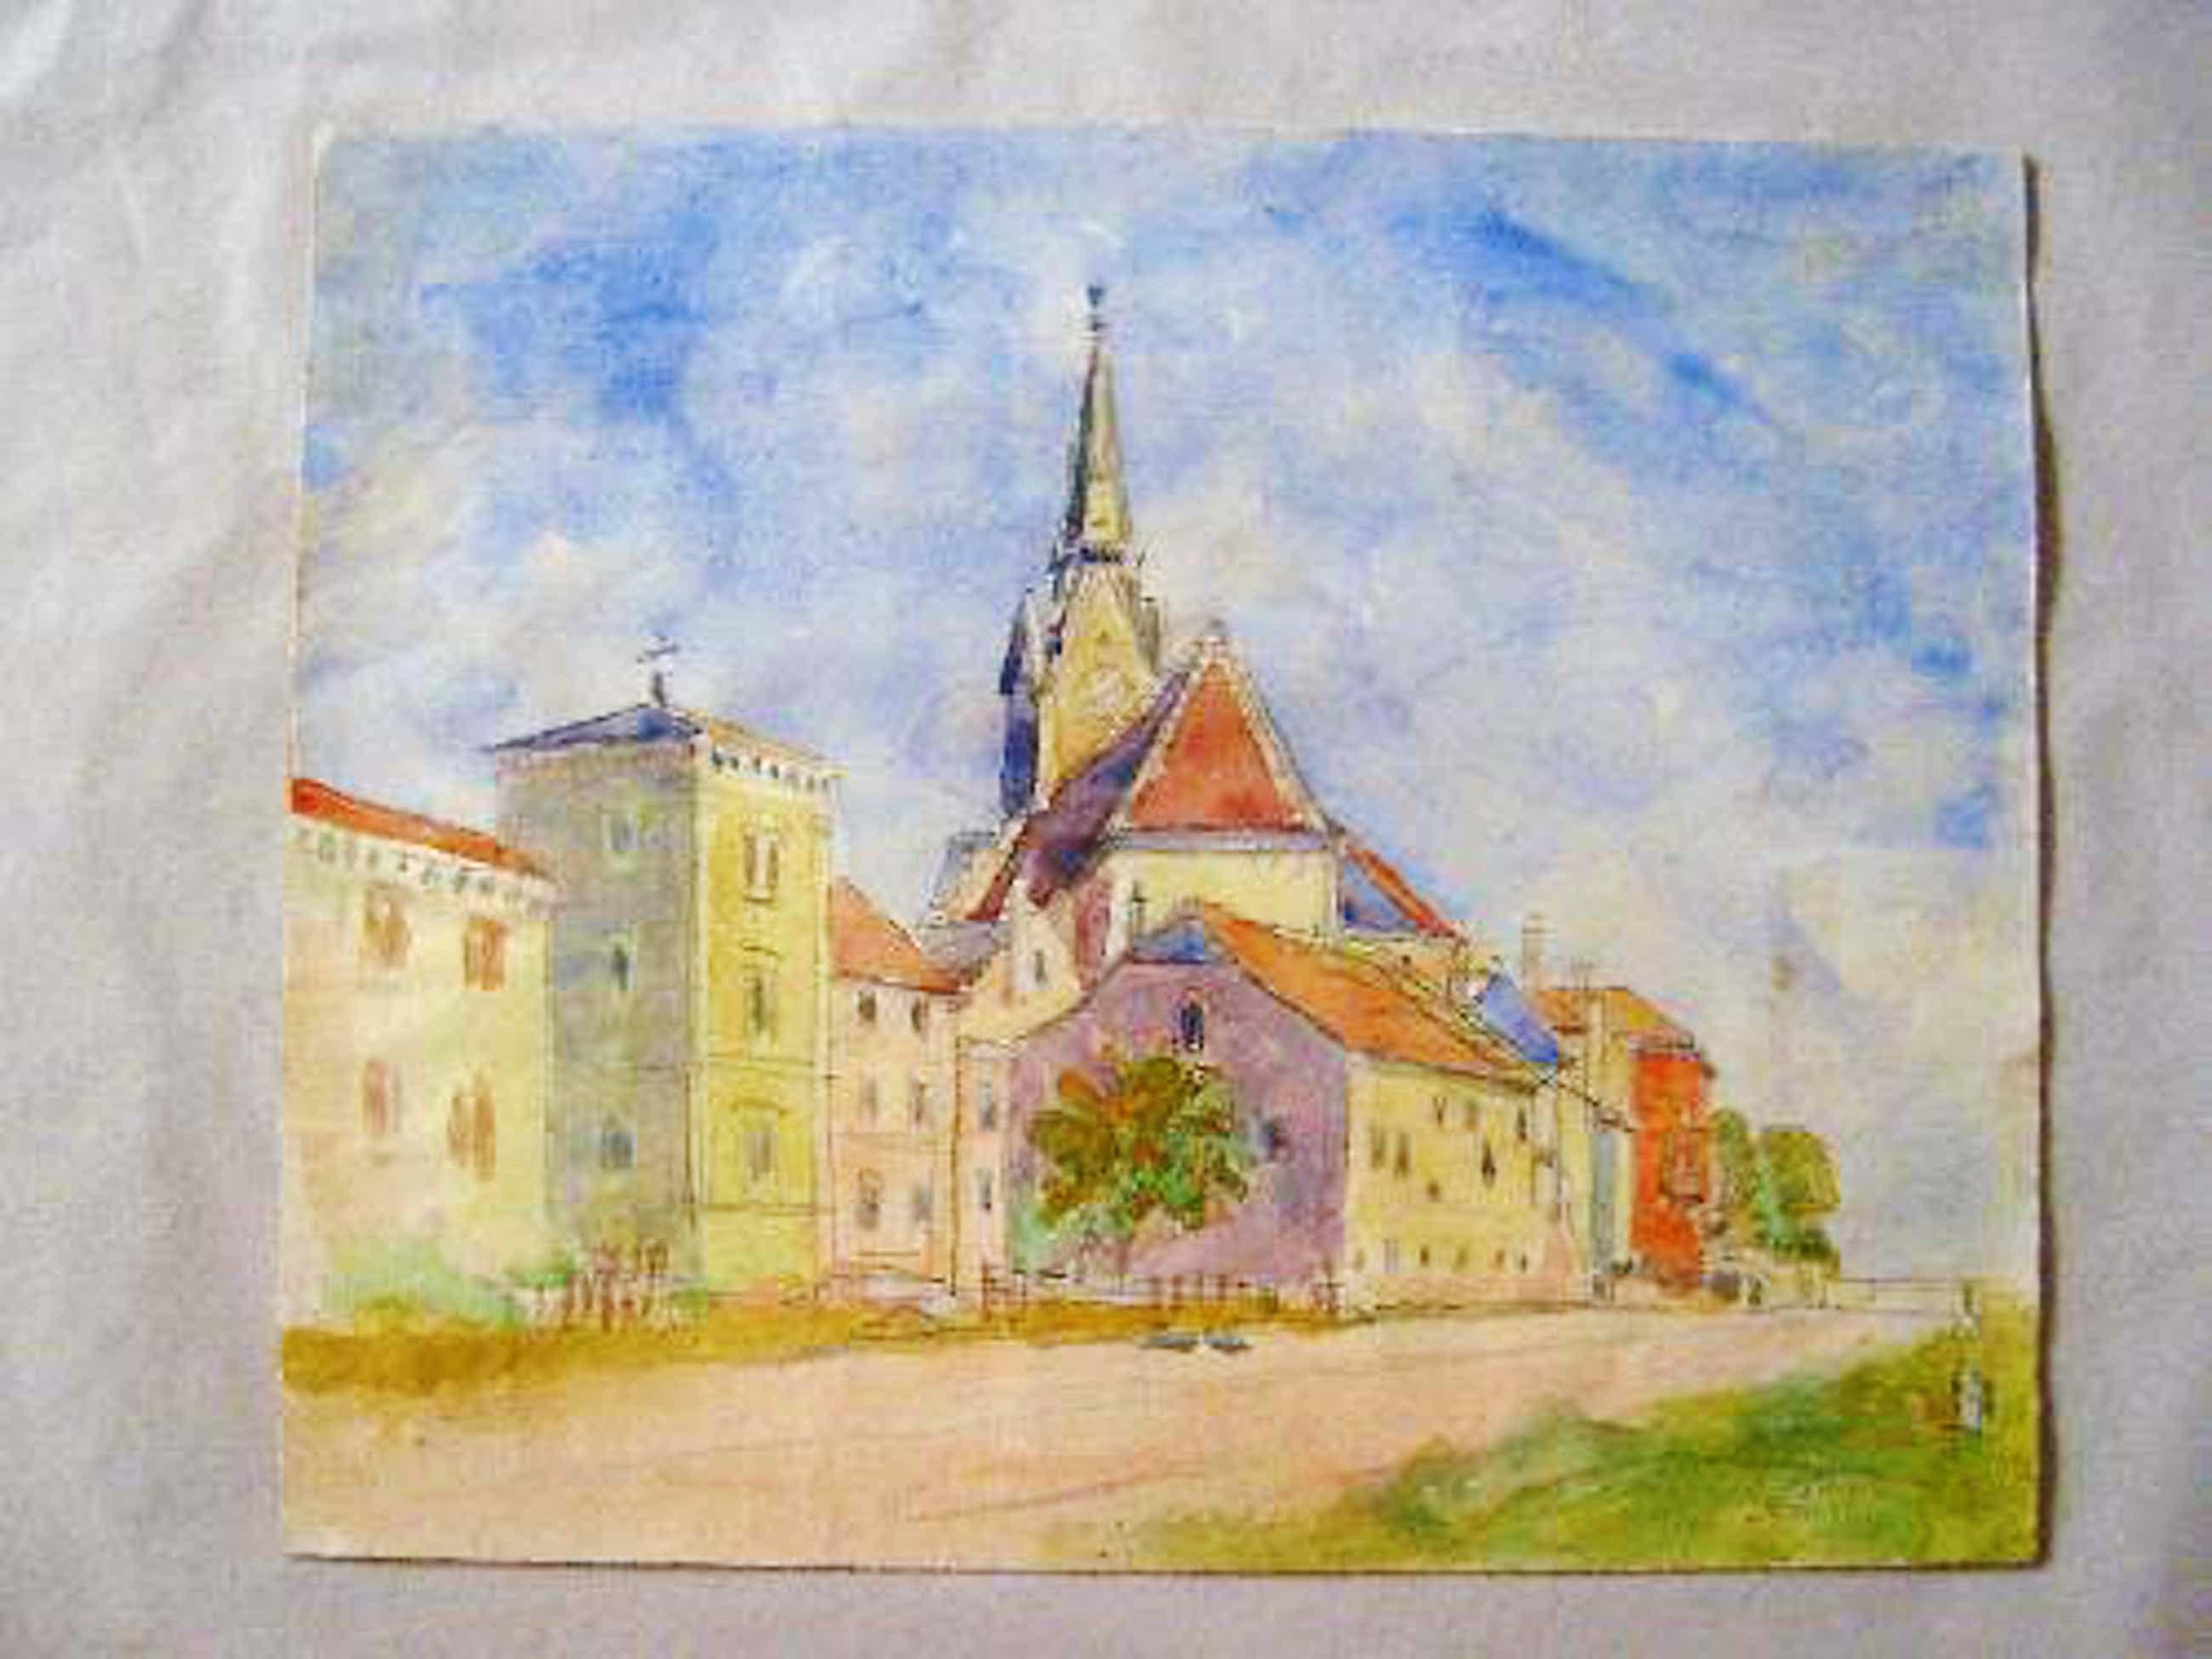 Anton Storch - -YBBS AN DER DONAU- mit hl. Laurentius-Kirche, Aquarell, handsigniert, 1959 kopen? Bied vanaf 290!